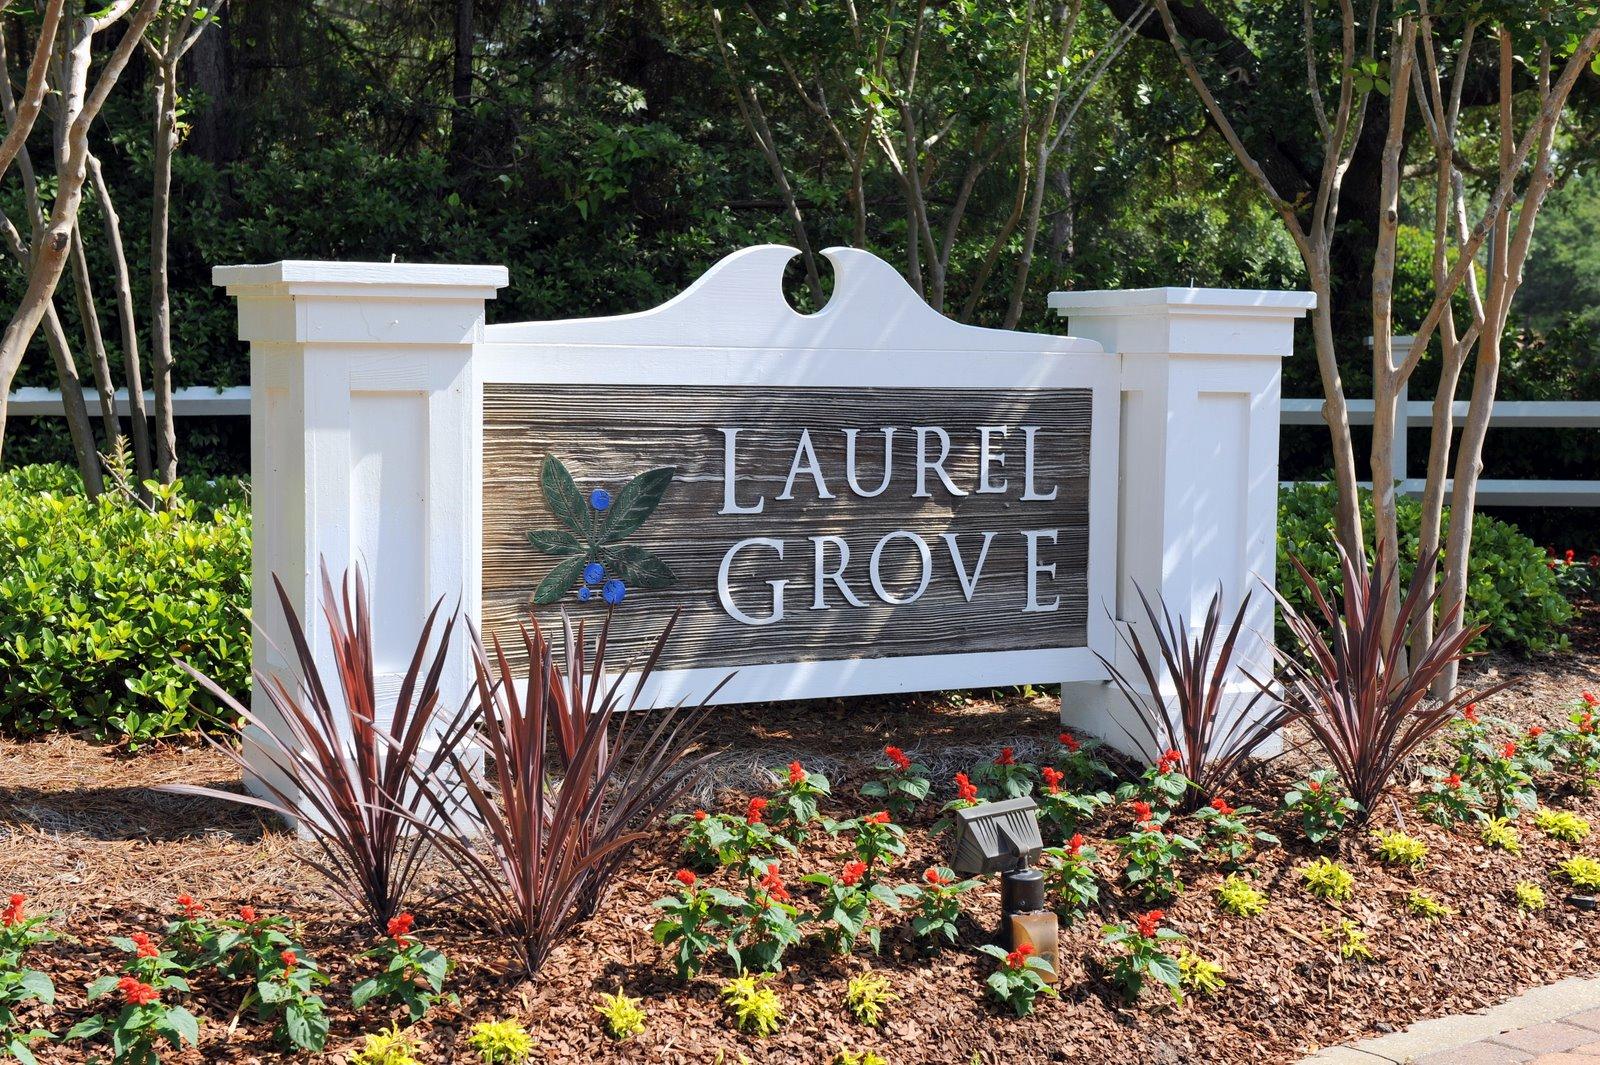 1280 Laurel Grove Condo rental in Sandestin Rentals ~ Cottages and Villas  in Destin Florida - #25